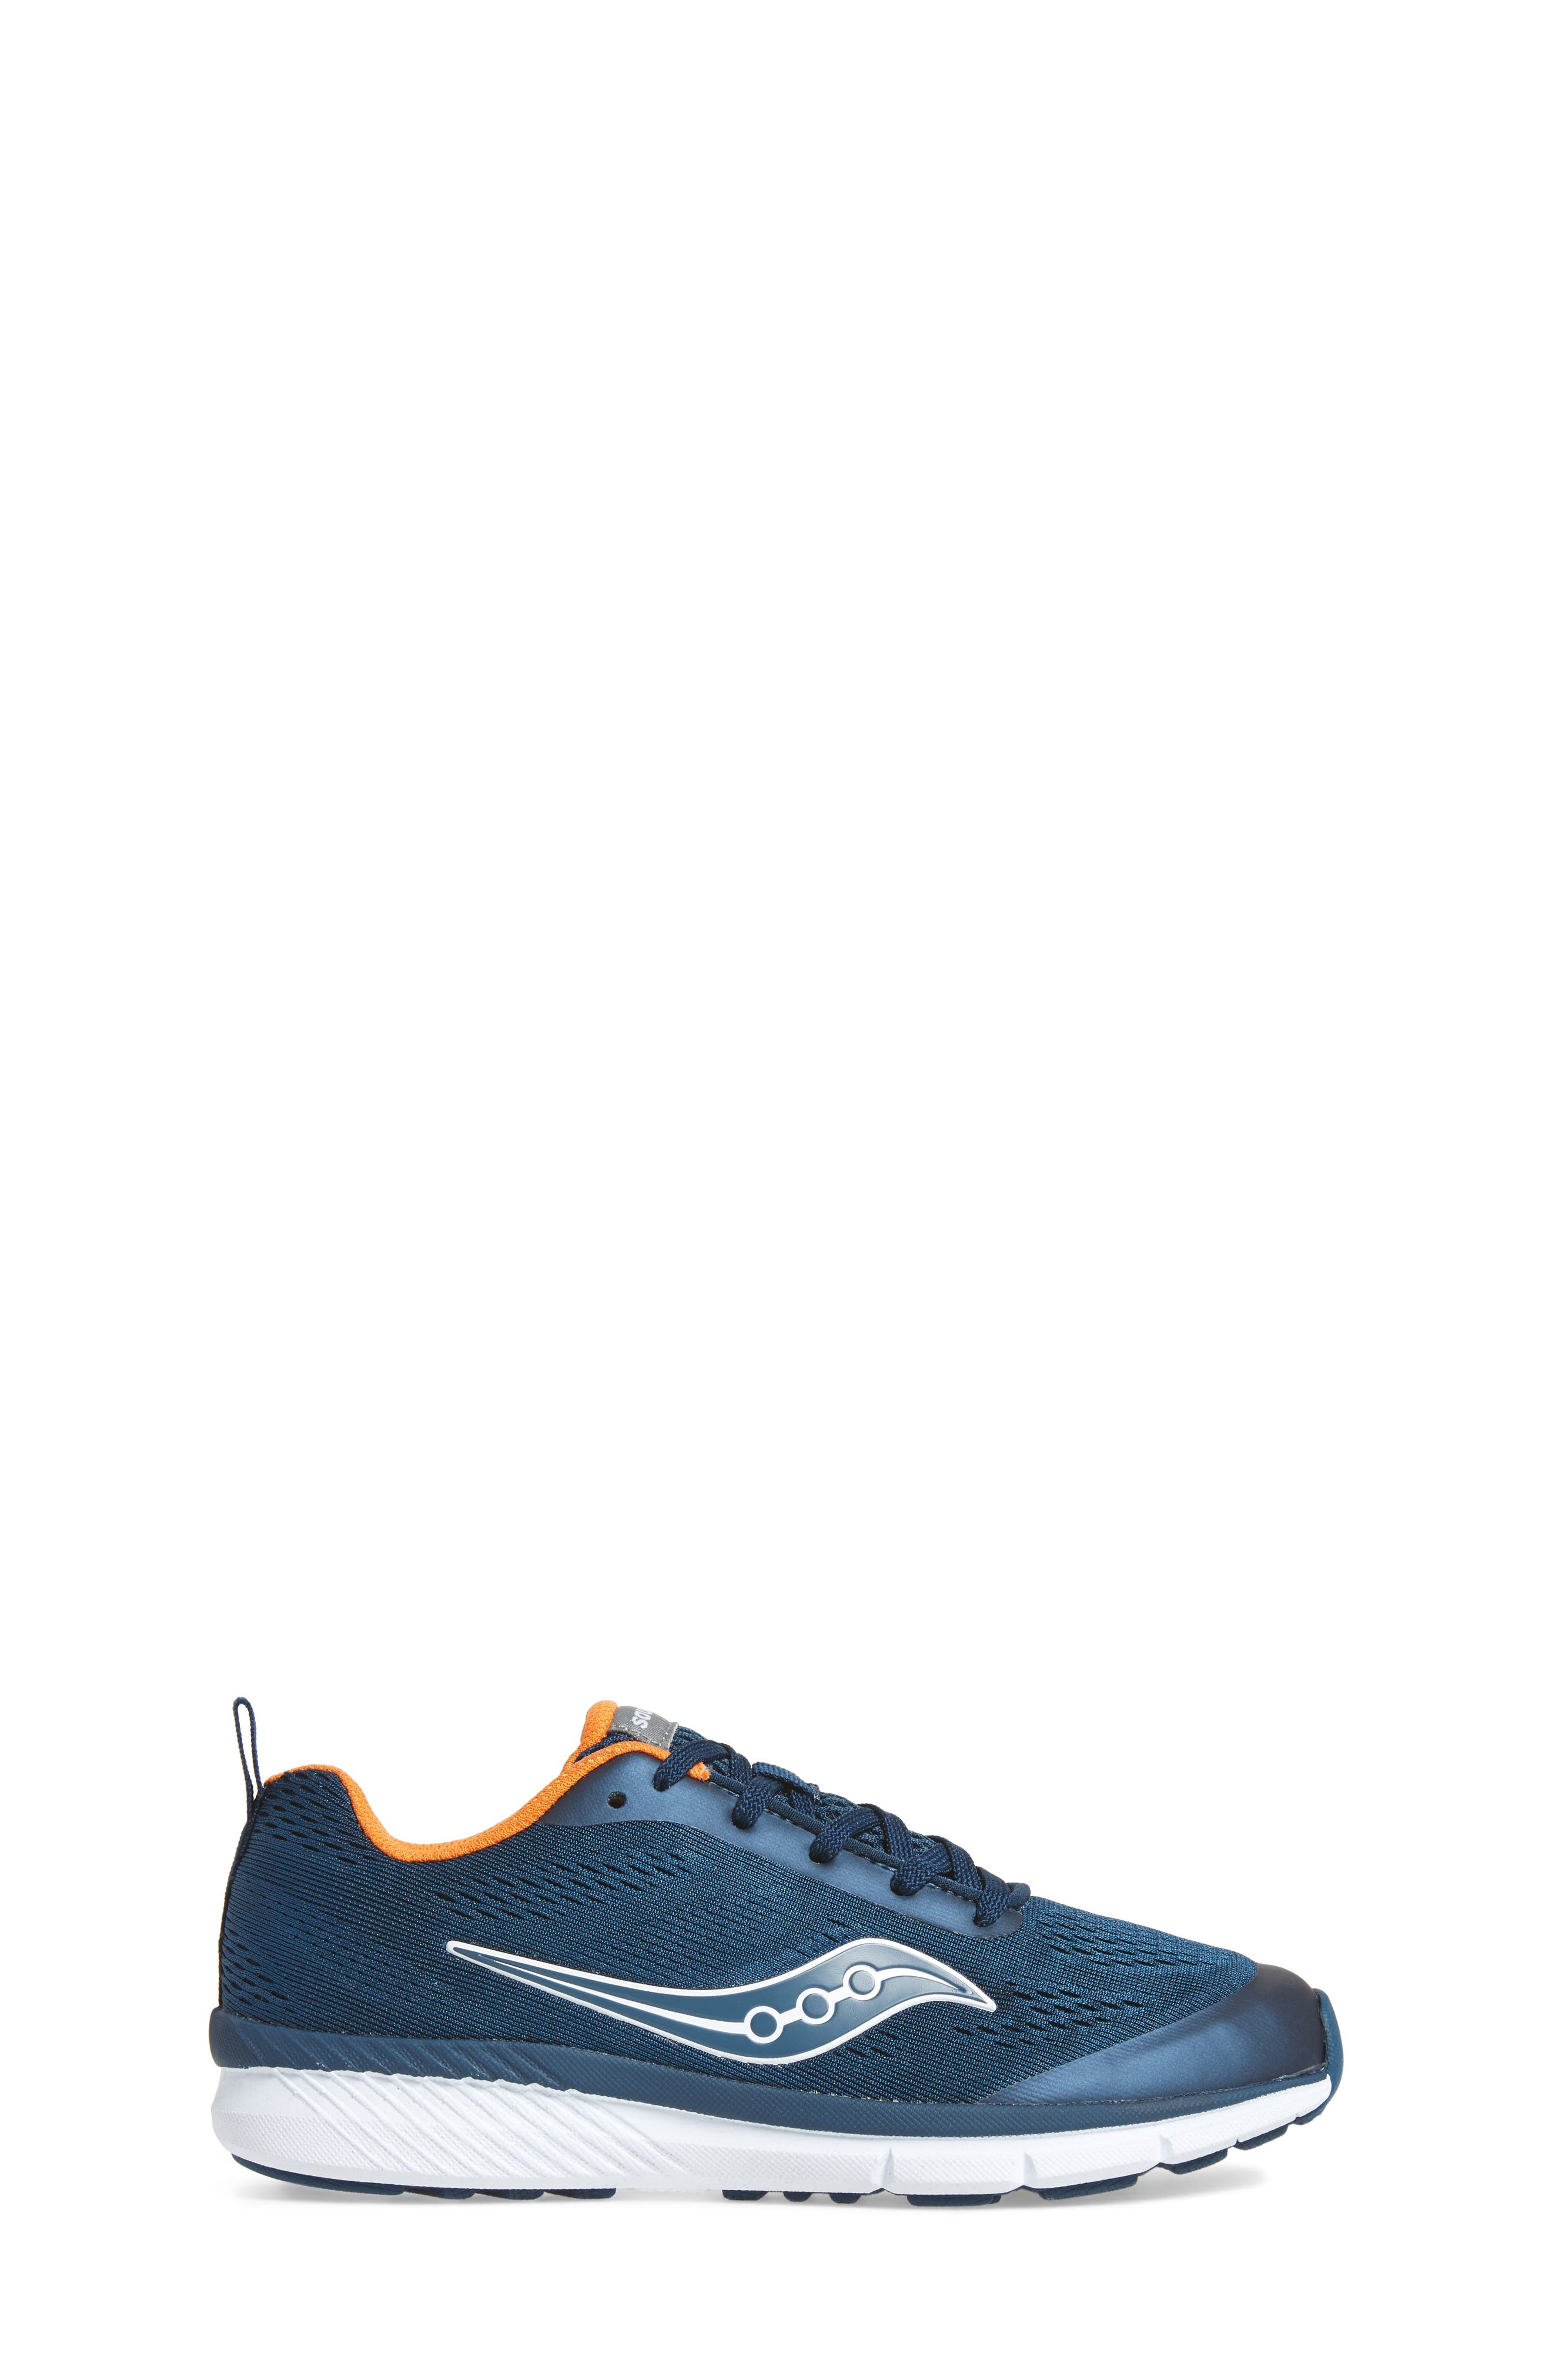 Alternate Image 3  - Saucony Ideal Sneaker (Toddler, Little Kid & Big Kid)